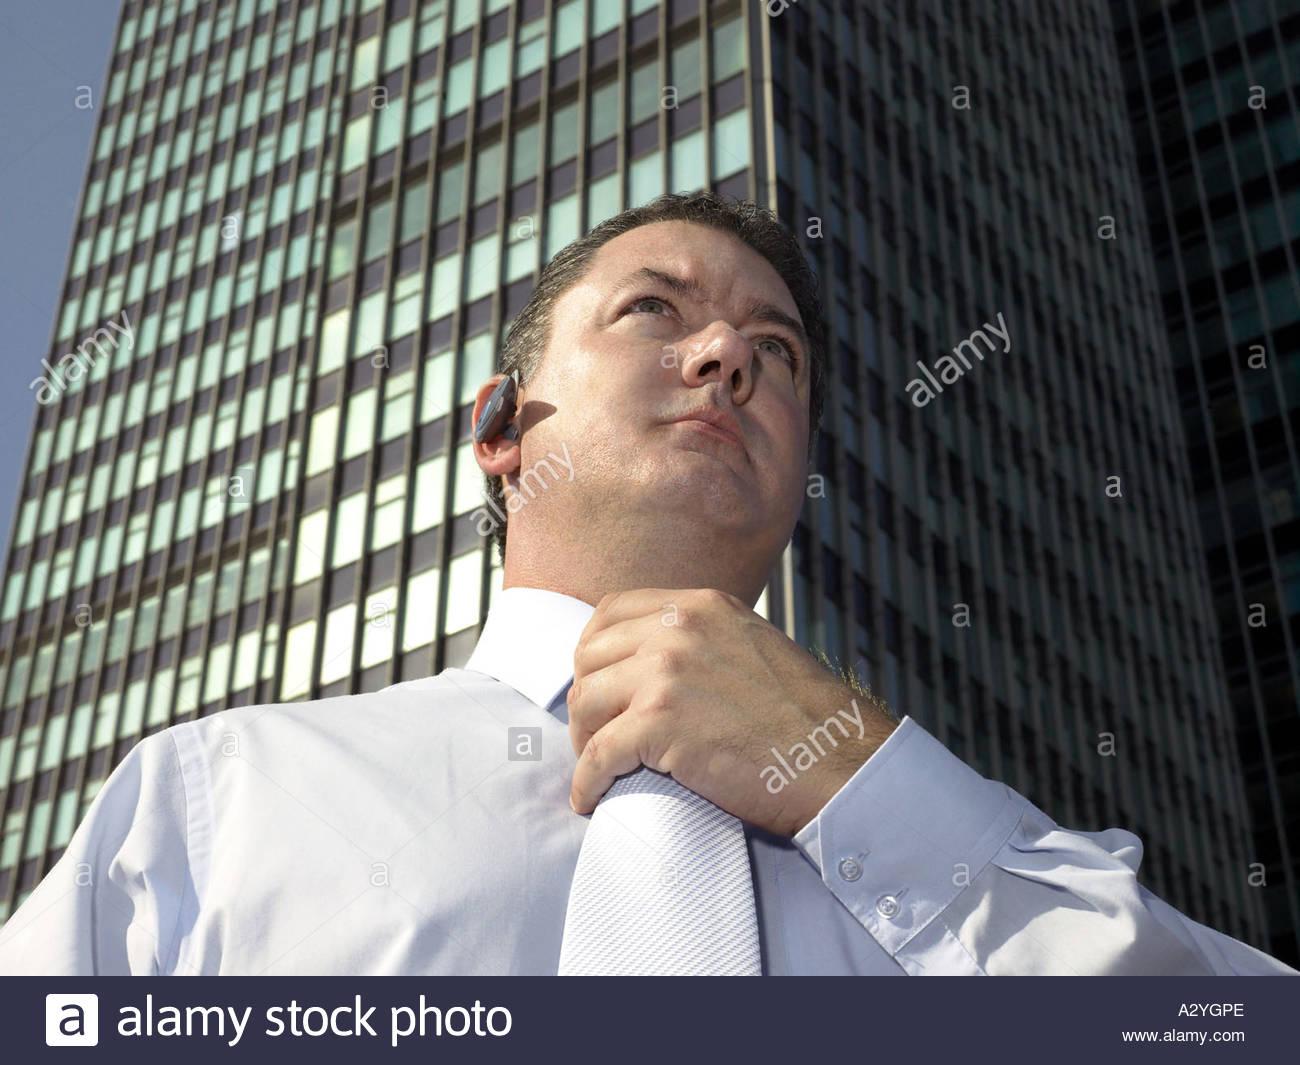 Businessman adjusting his necktie - Stock Image